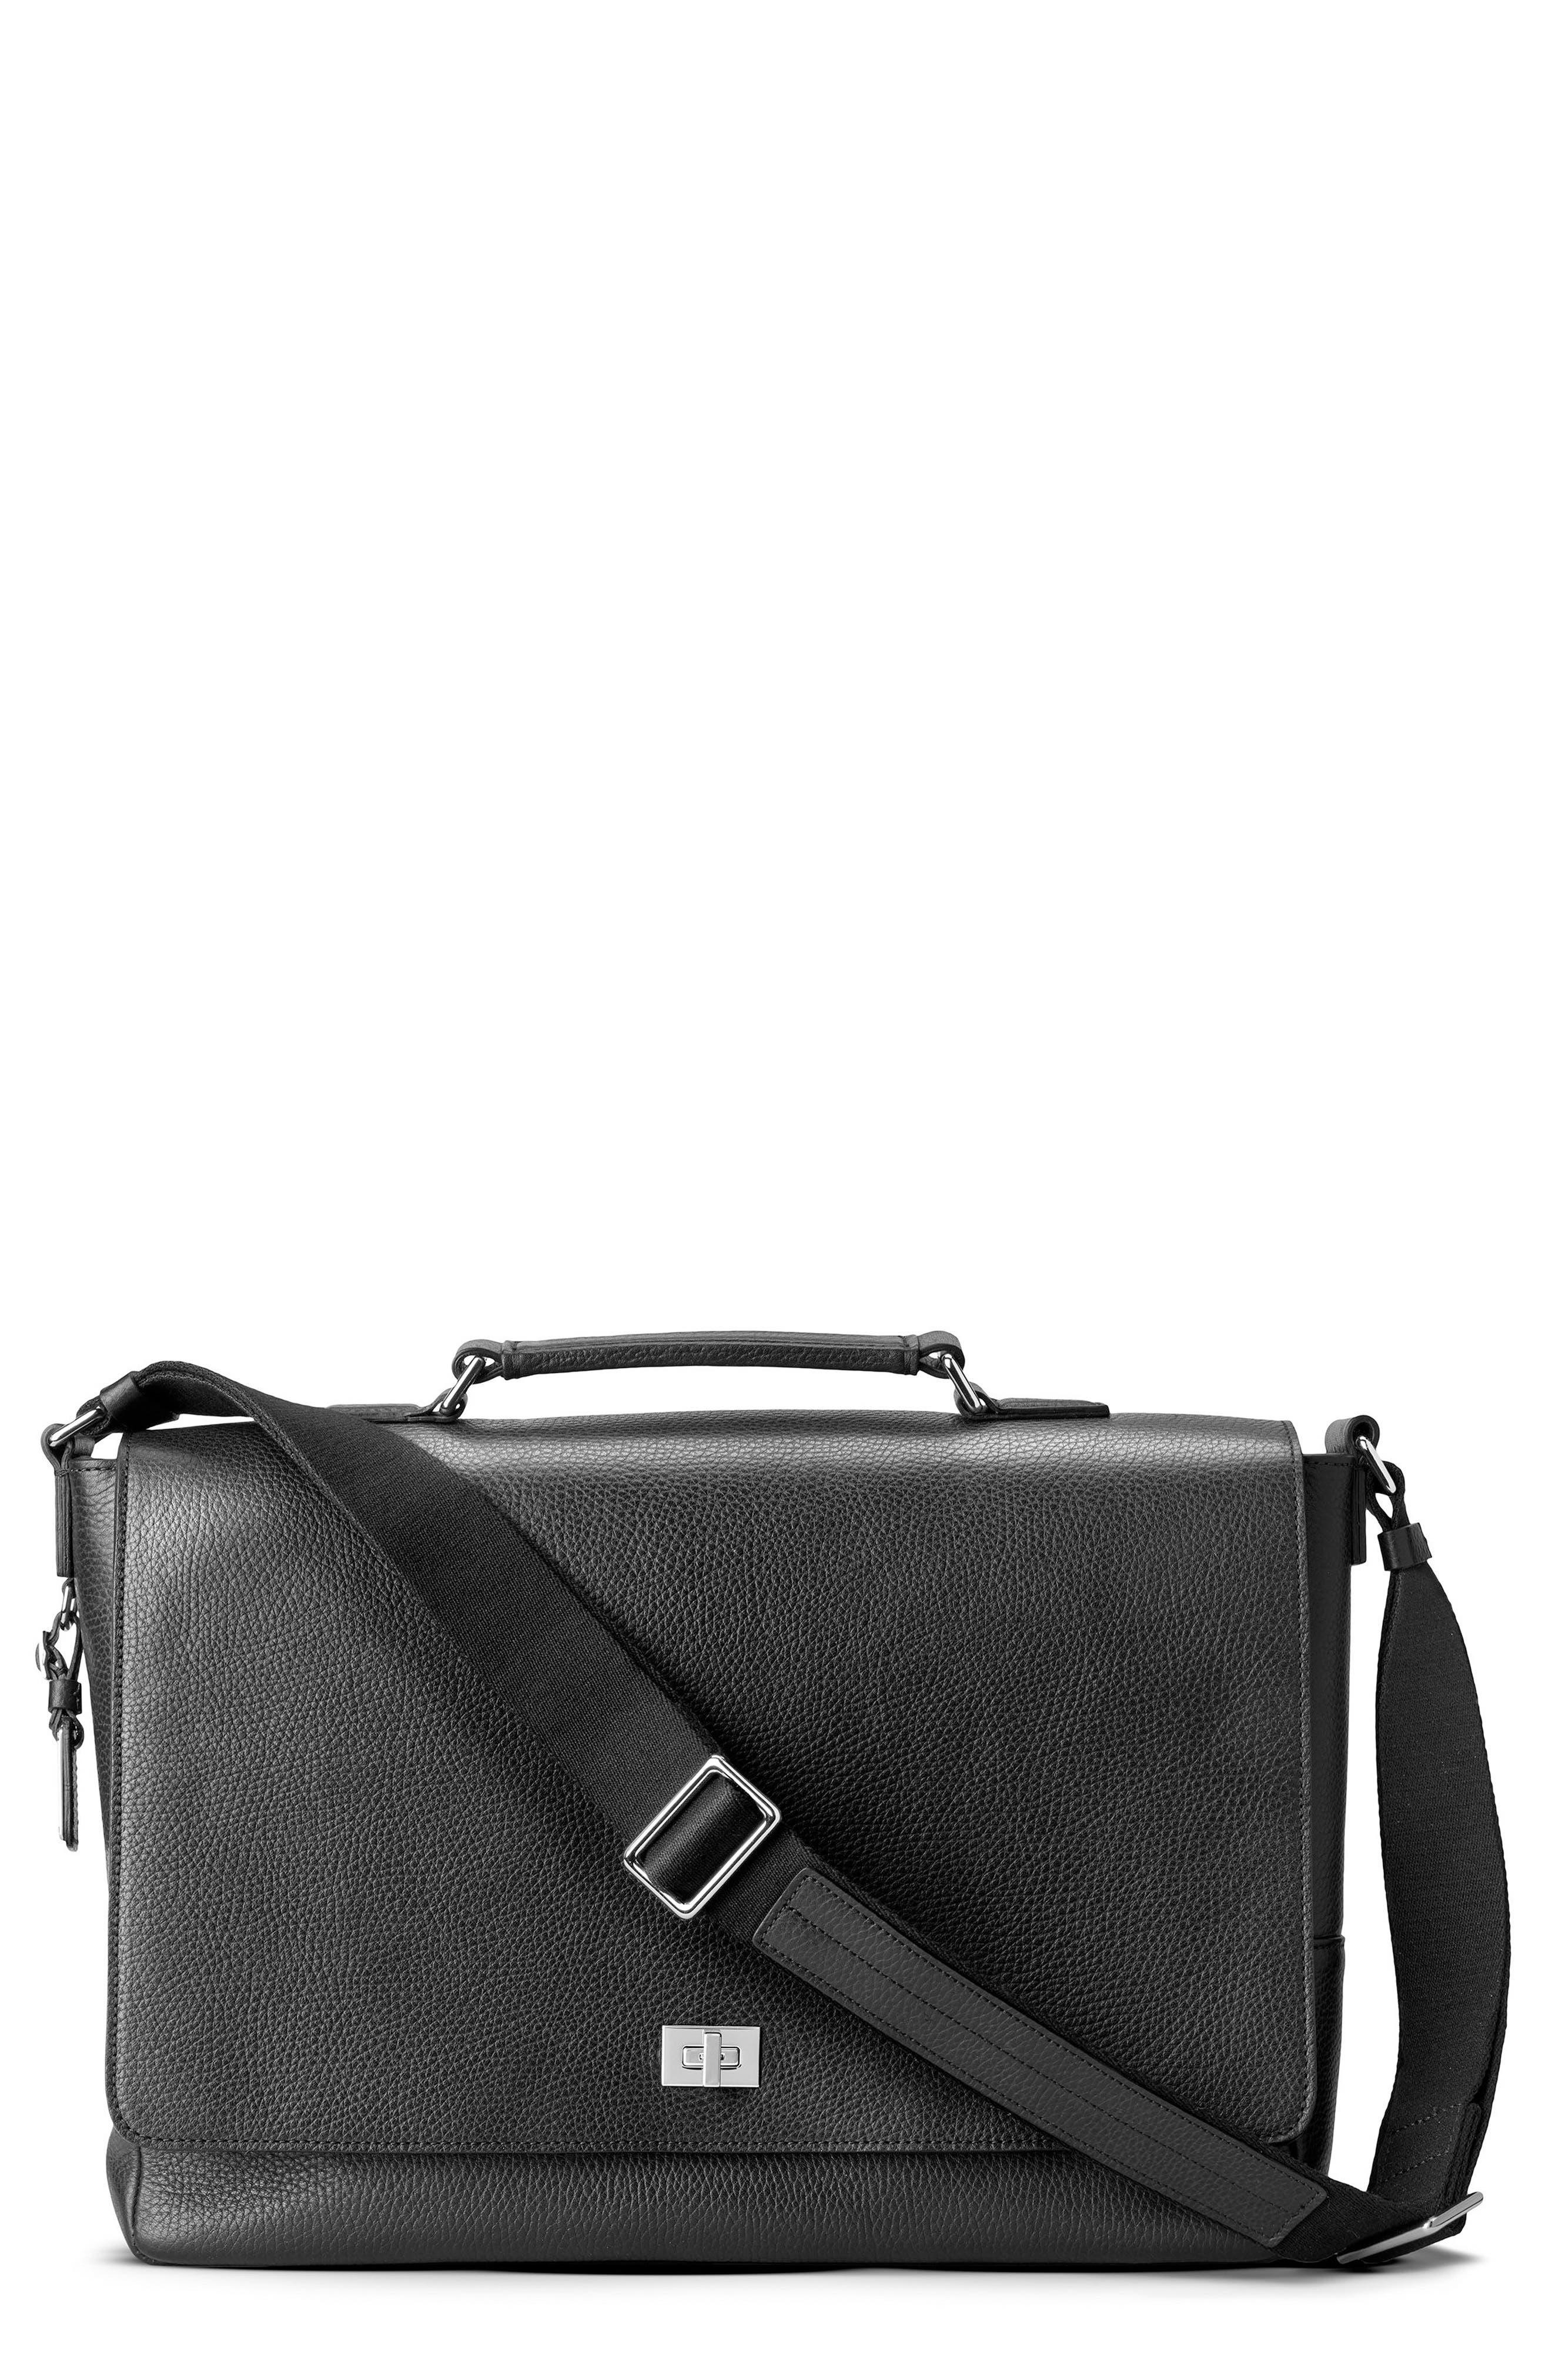 Leather Messenger Bag,                             Main thumbnail 1, color,                             BLACK